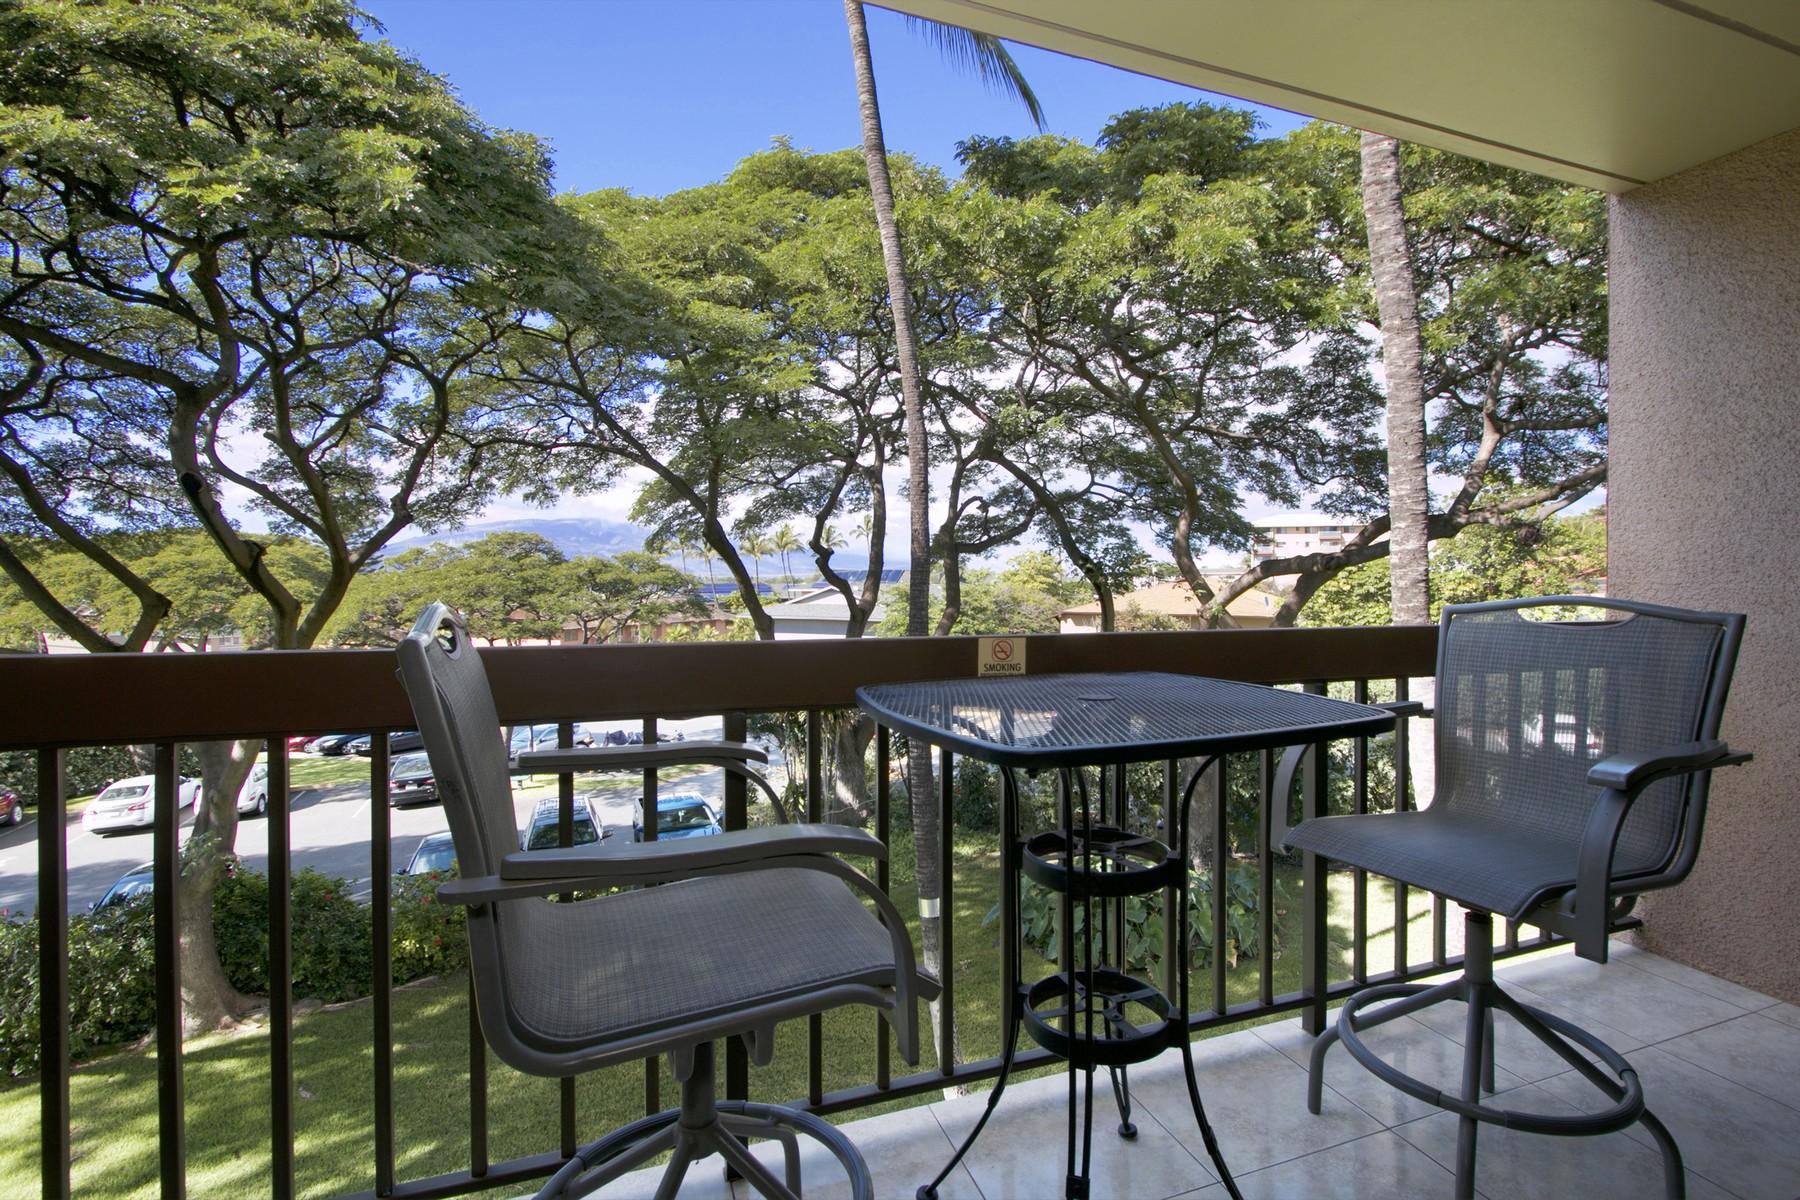 Кондоминиум для того Продажа на South Kihei Vacation-Rentable Winner! 2191 South Kihei Road, Maui Vista 2318 Kihei, Гавайи, 96753 Соединенные Штаты